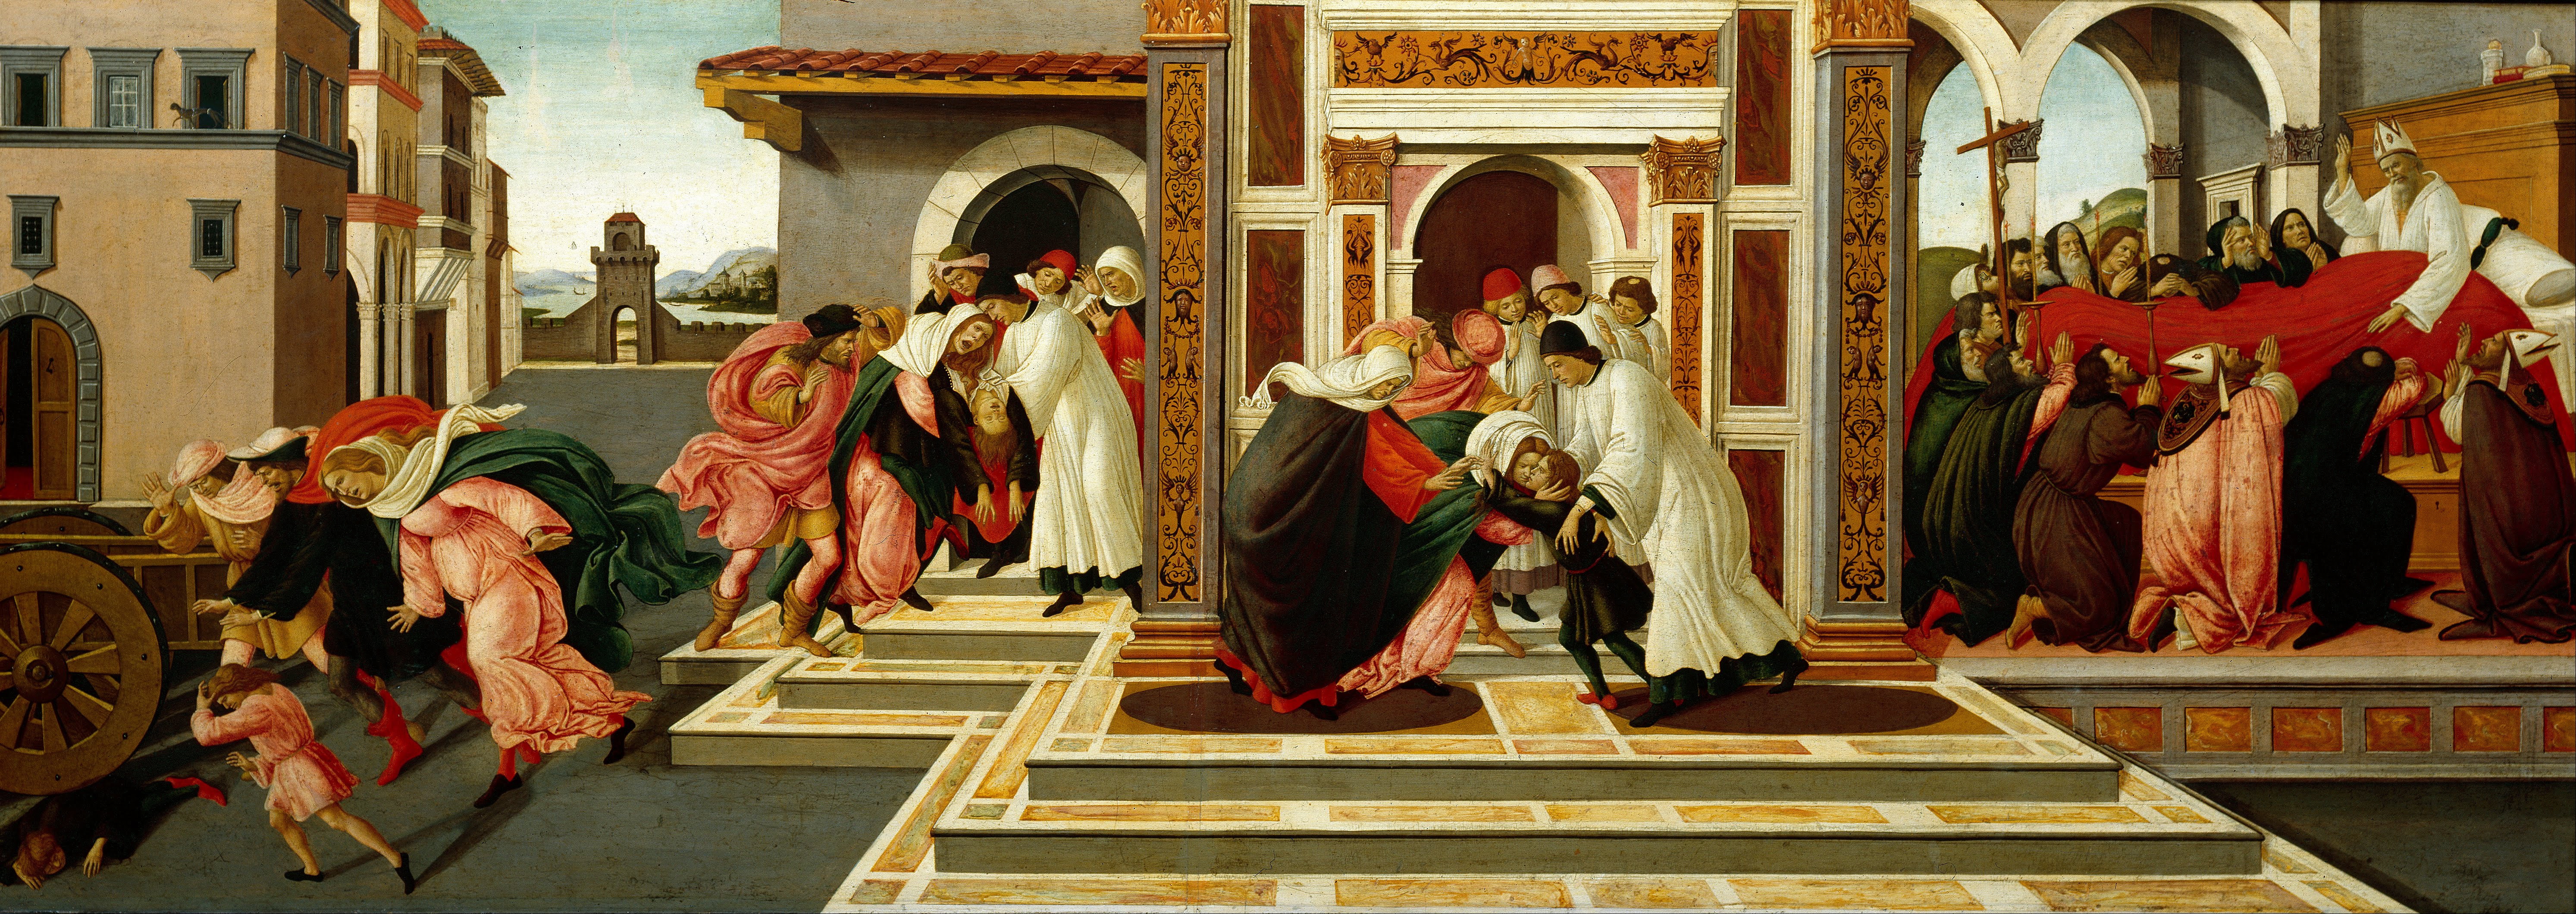 sandro botticelli on pinterest madonna and child